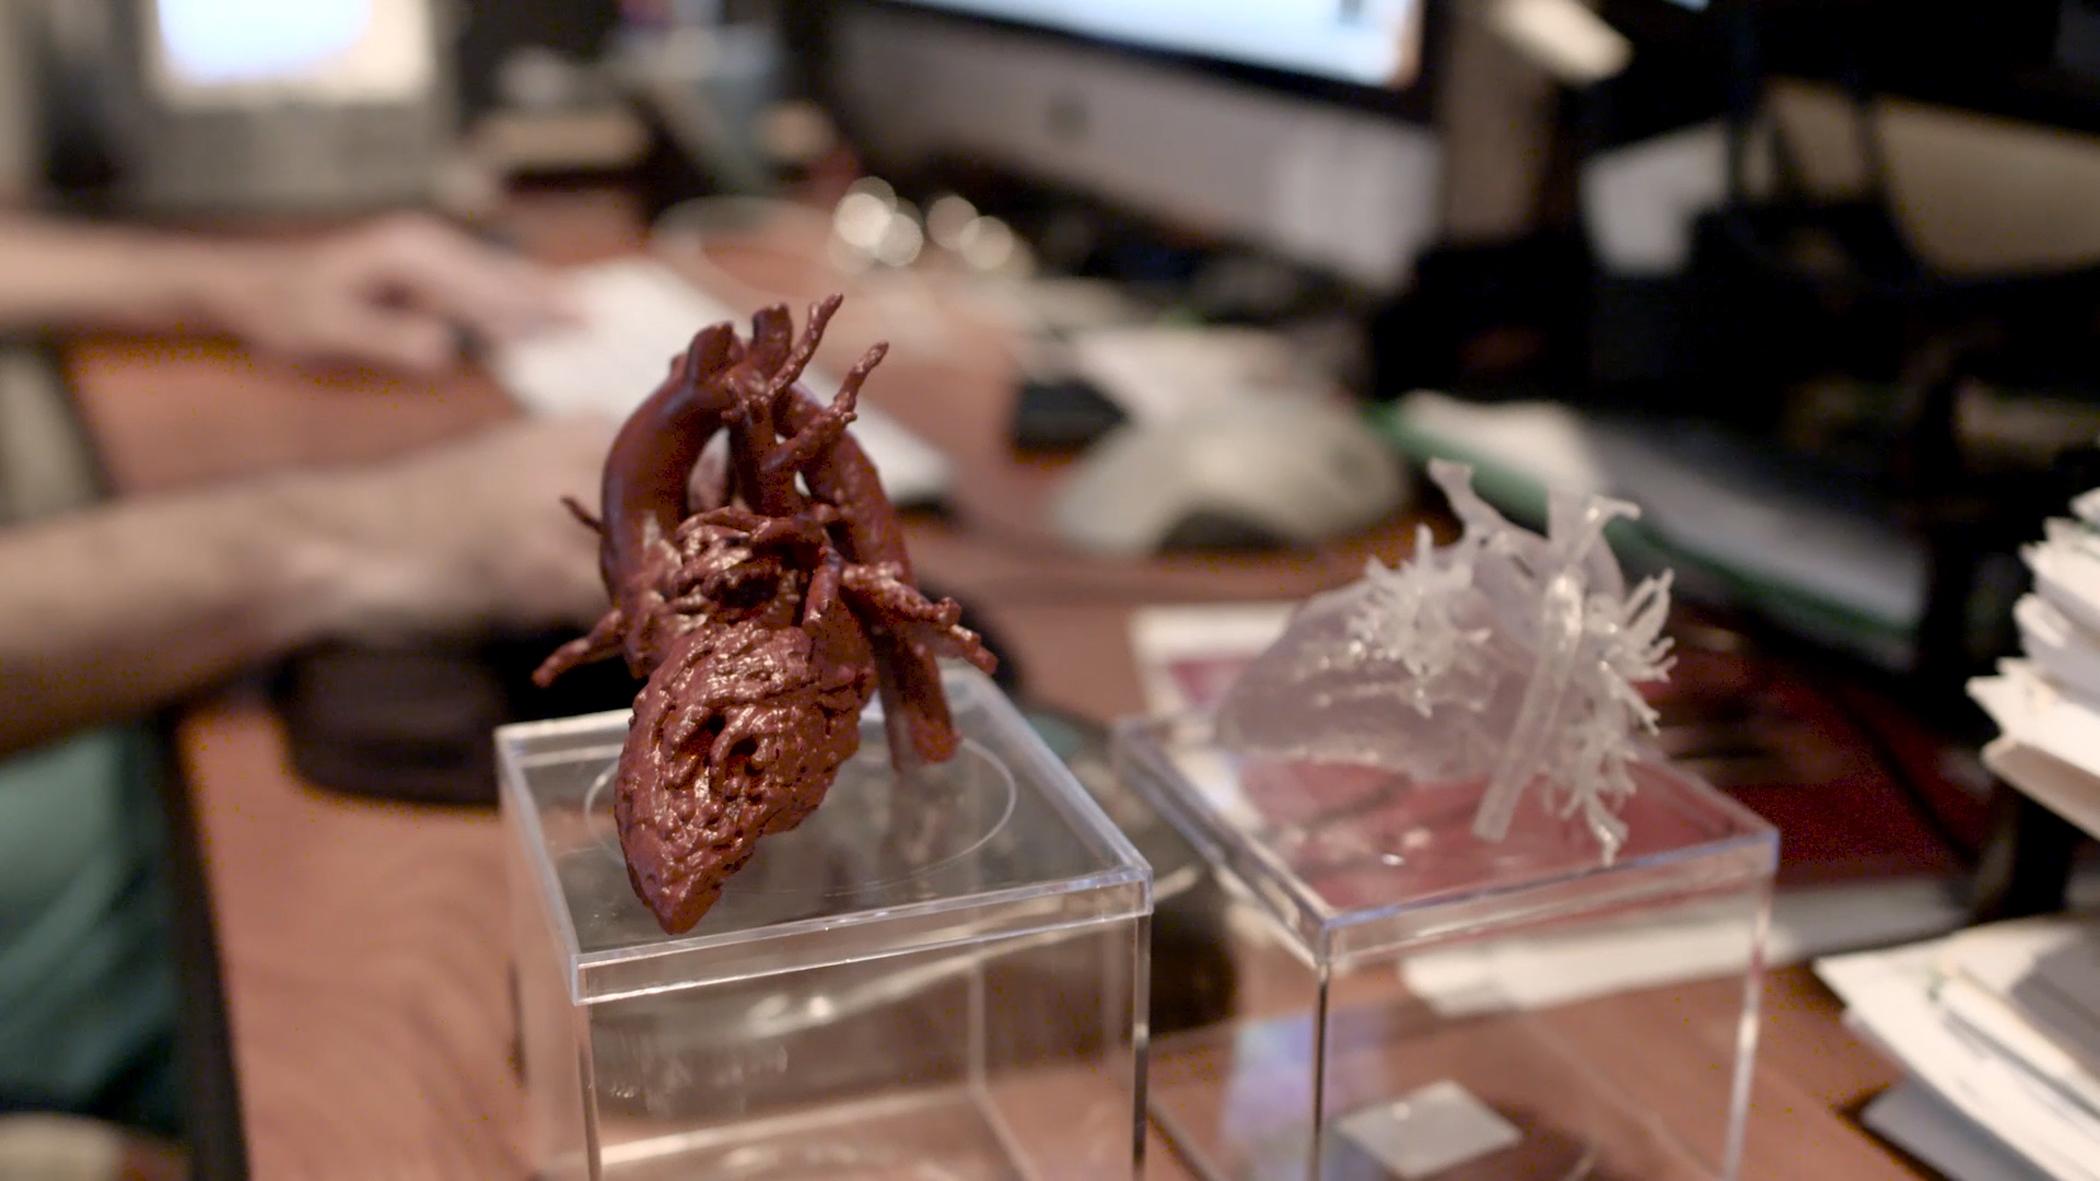 3d_printing_heart_surgery1_stratasys_mia_gonzalez